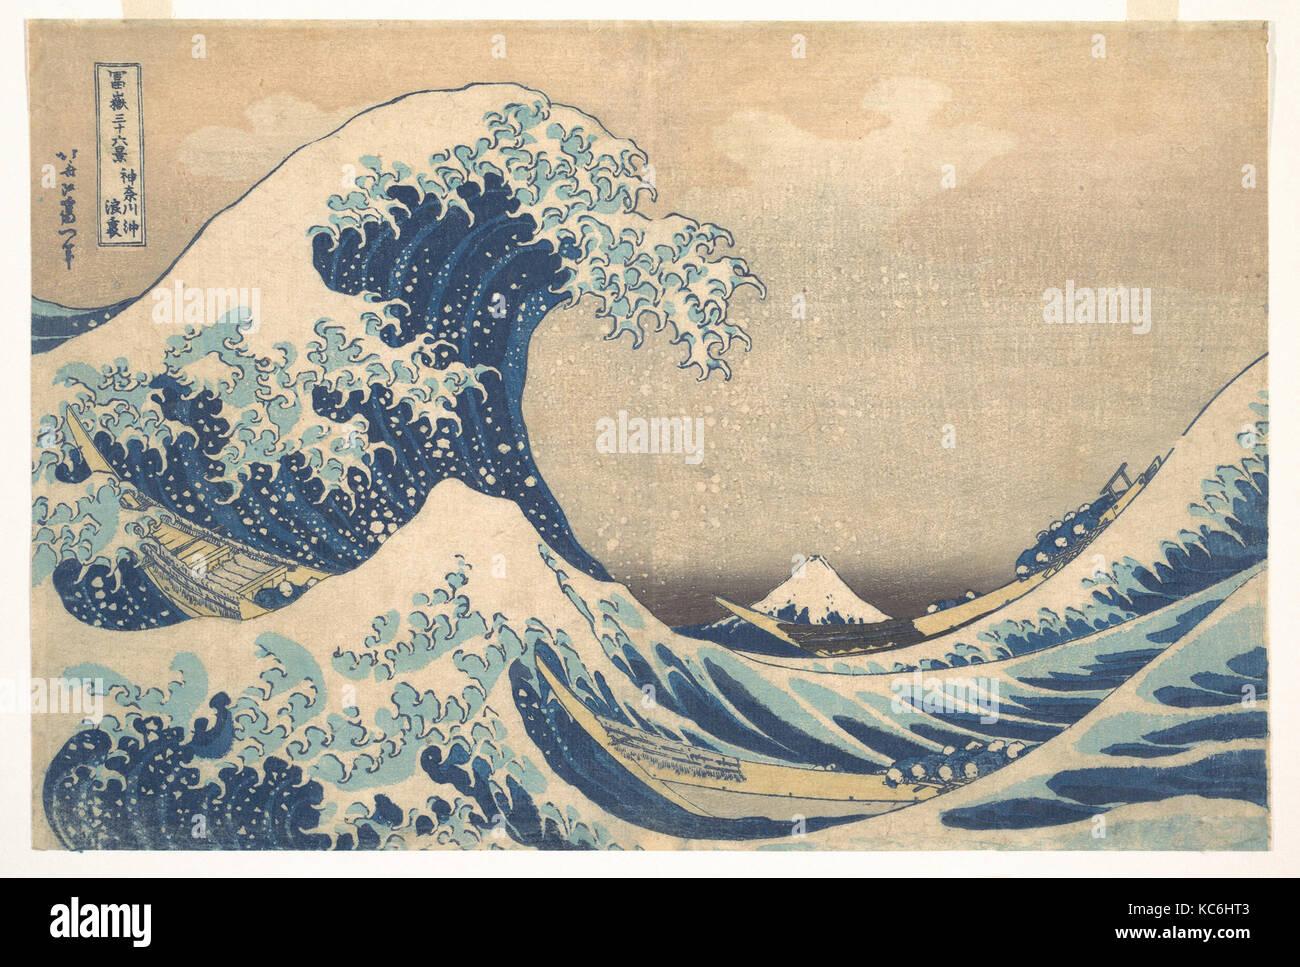 冨嶽三十六景 神奈川沖浪裏, Under the Wave off Kanagawa (Kanagawa oki nami ura), also known as The Great Wave Stock Photo